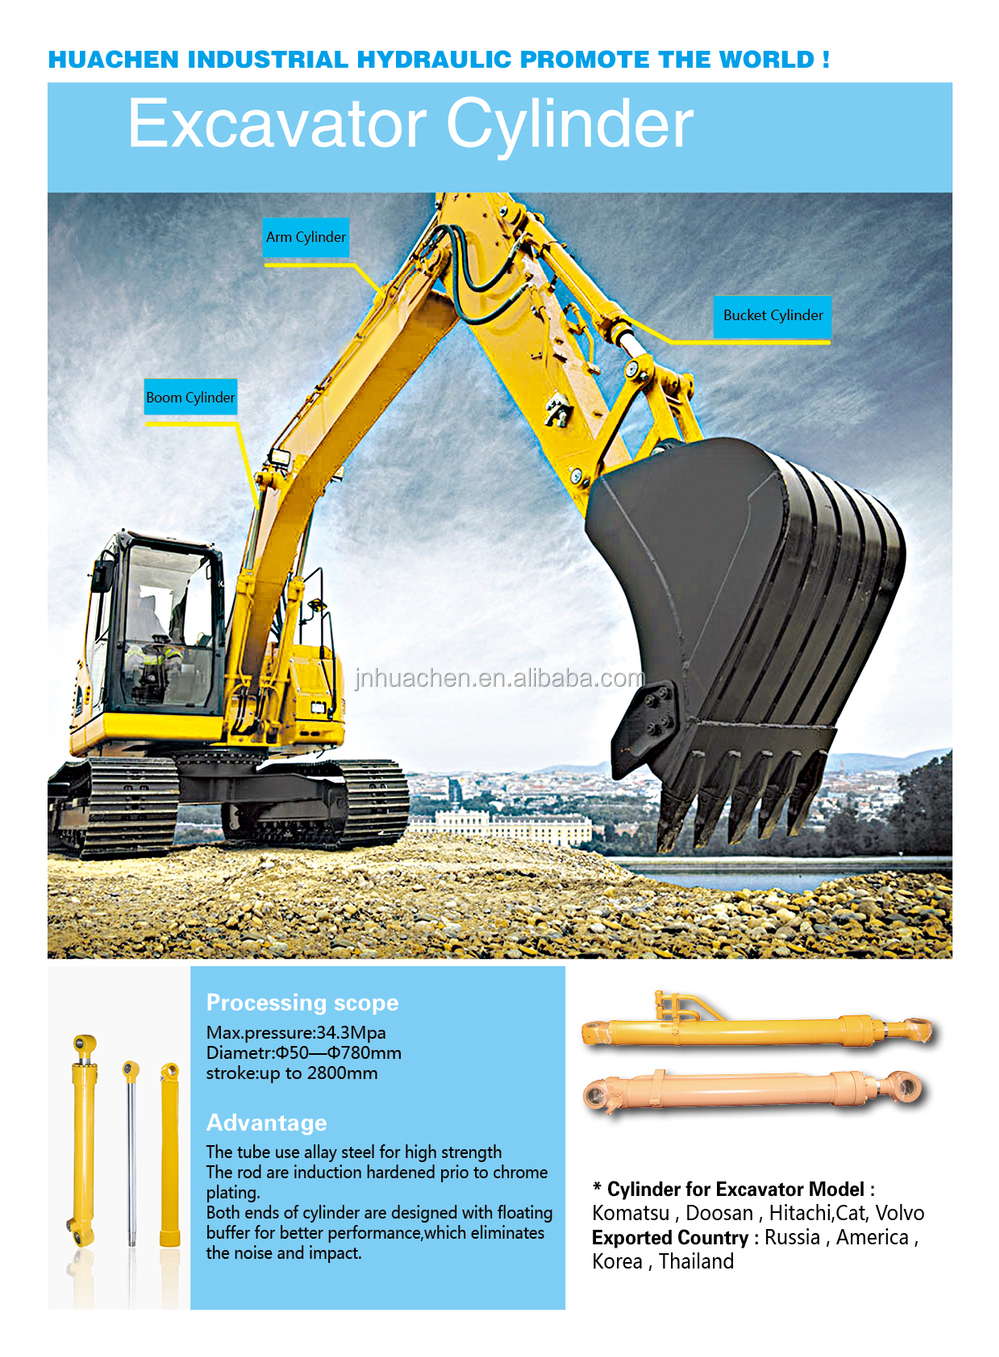 the best hydraulic cylinder for dump truck trailer excavator